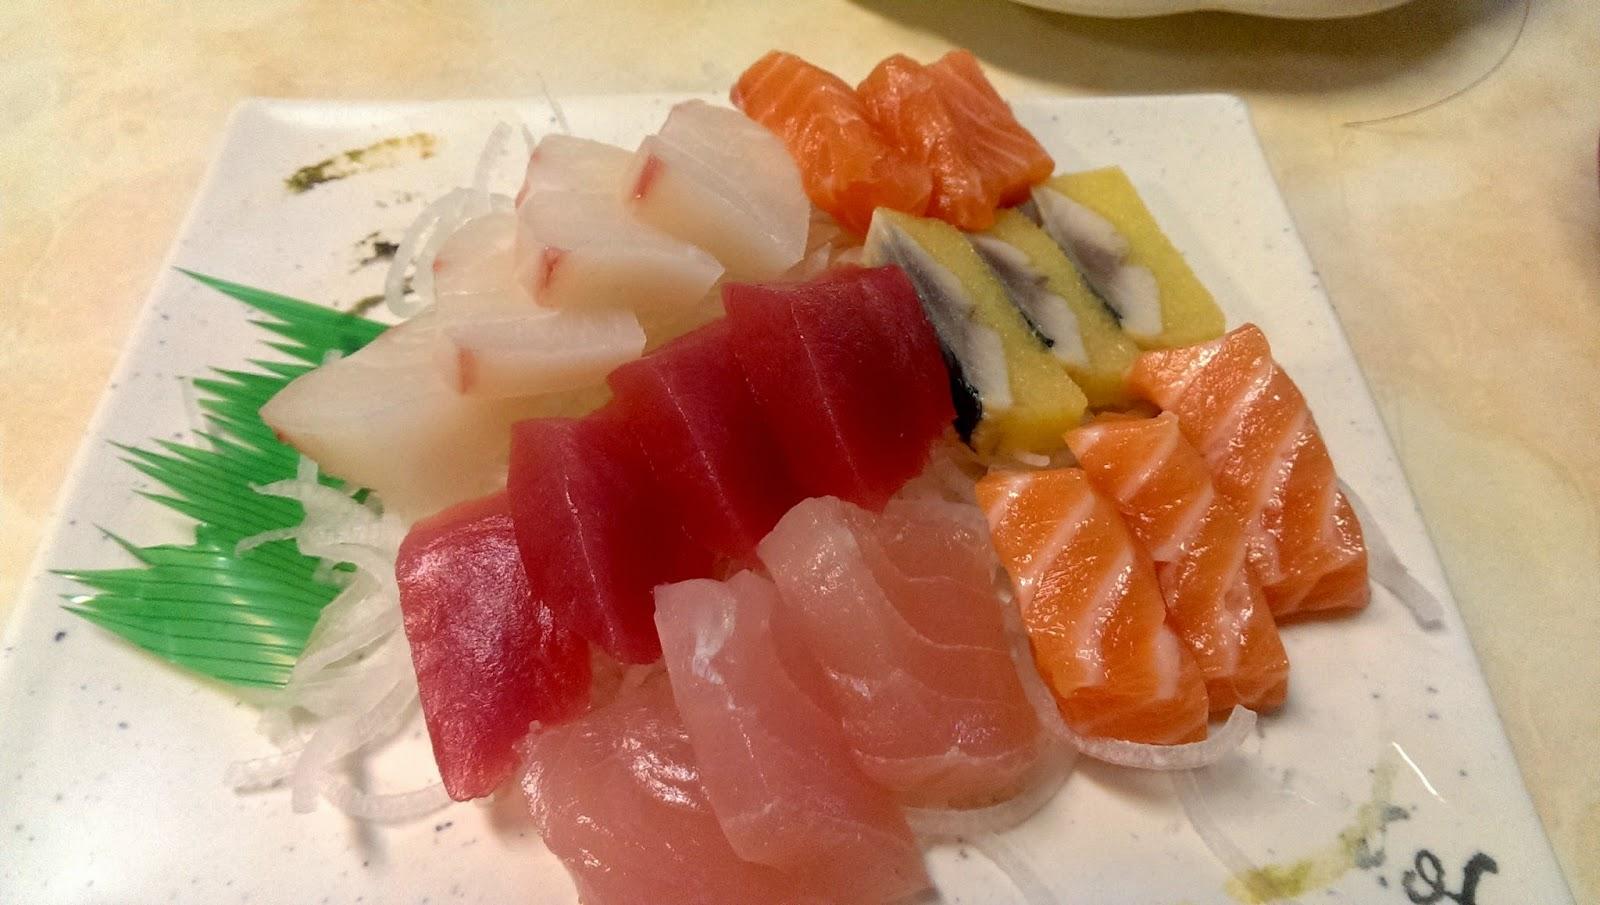 2015 02 02%2B12.12.25 - [食記] 葉家生魚片 - 布袋觀光漁市中的鮮魚餐廳